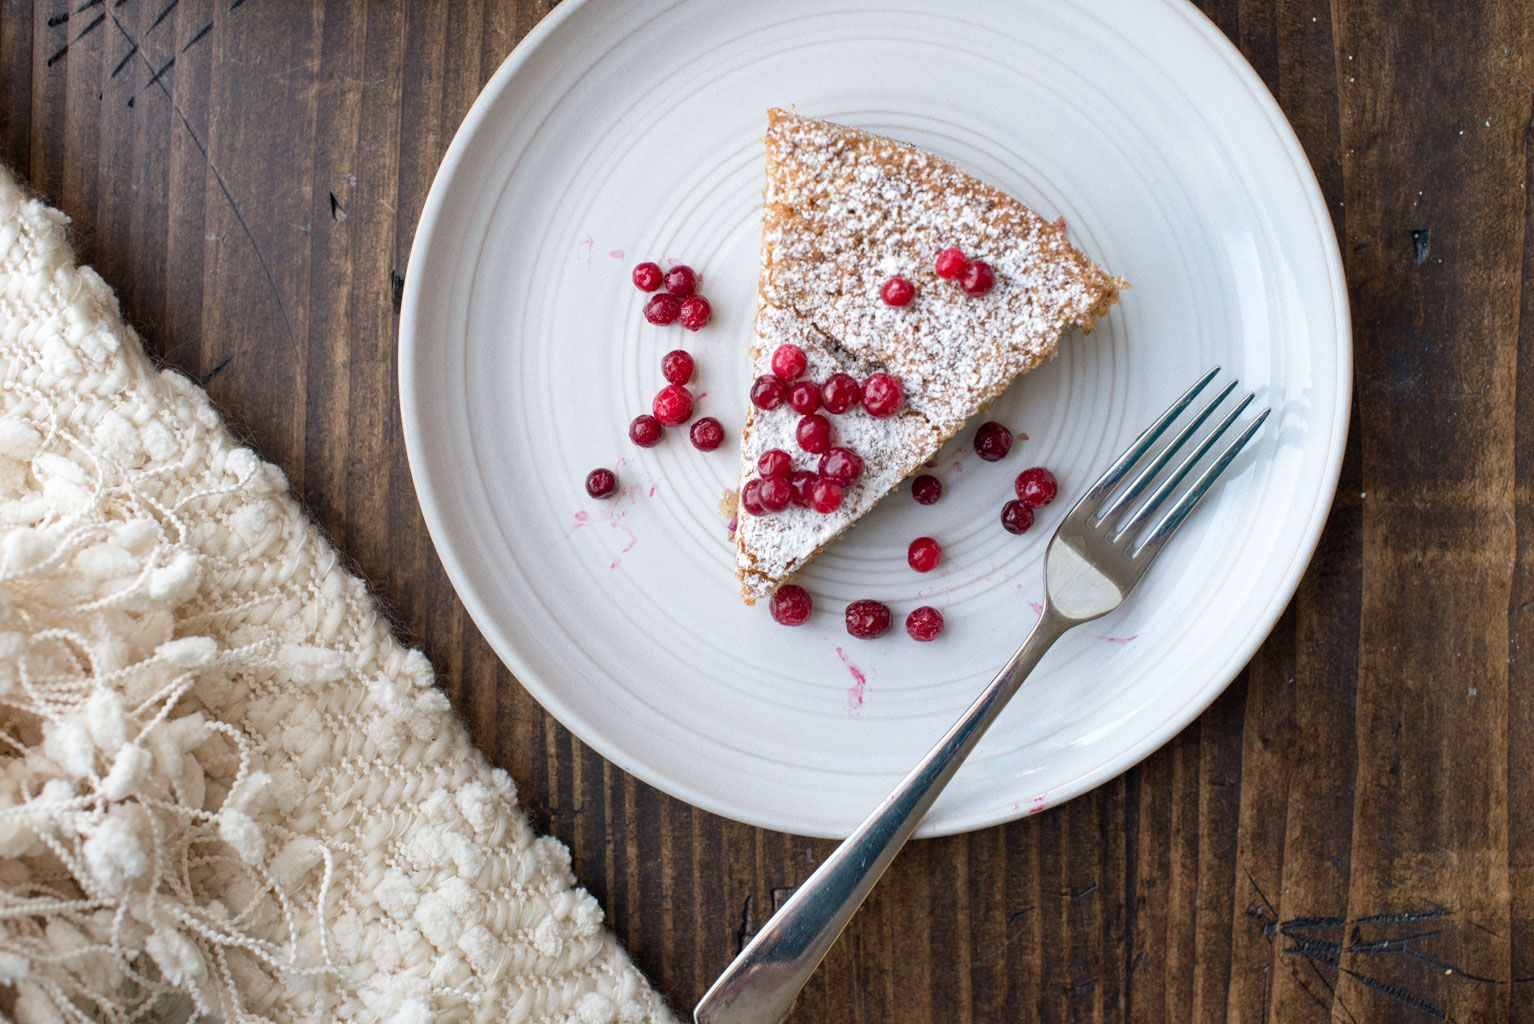 Glutenfree cake recipe with almond cardamom and